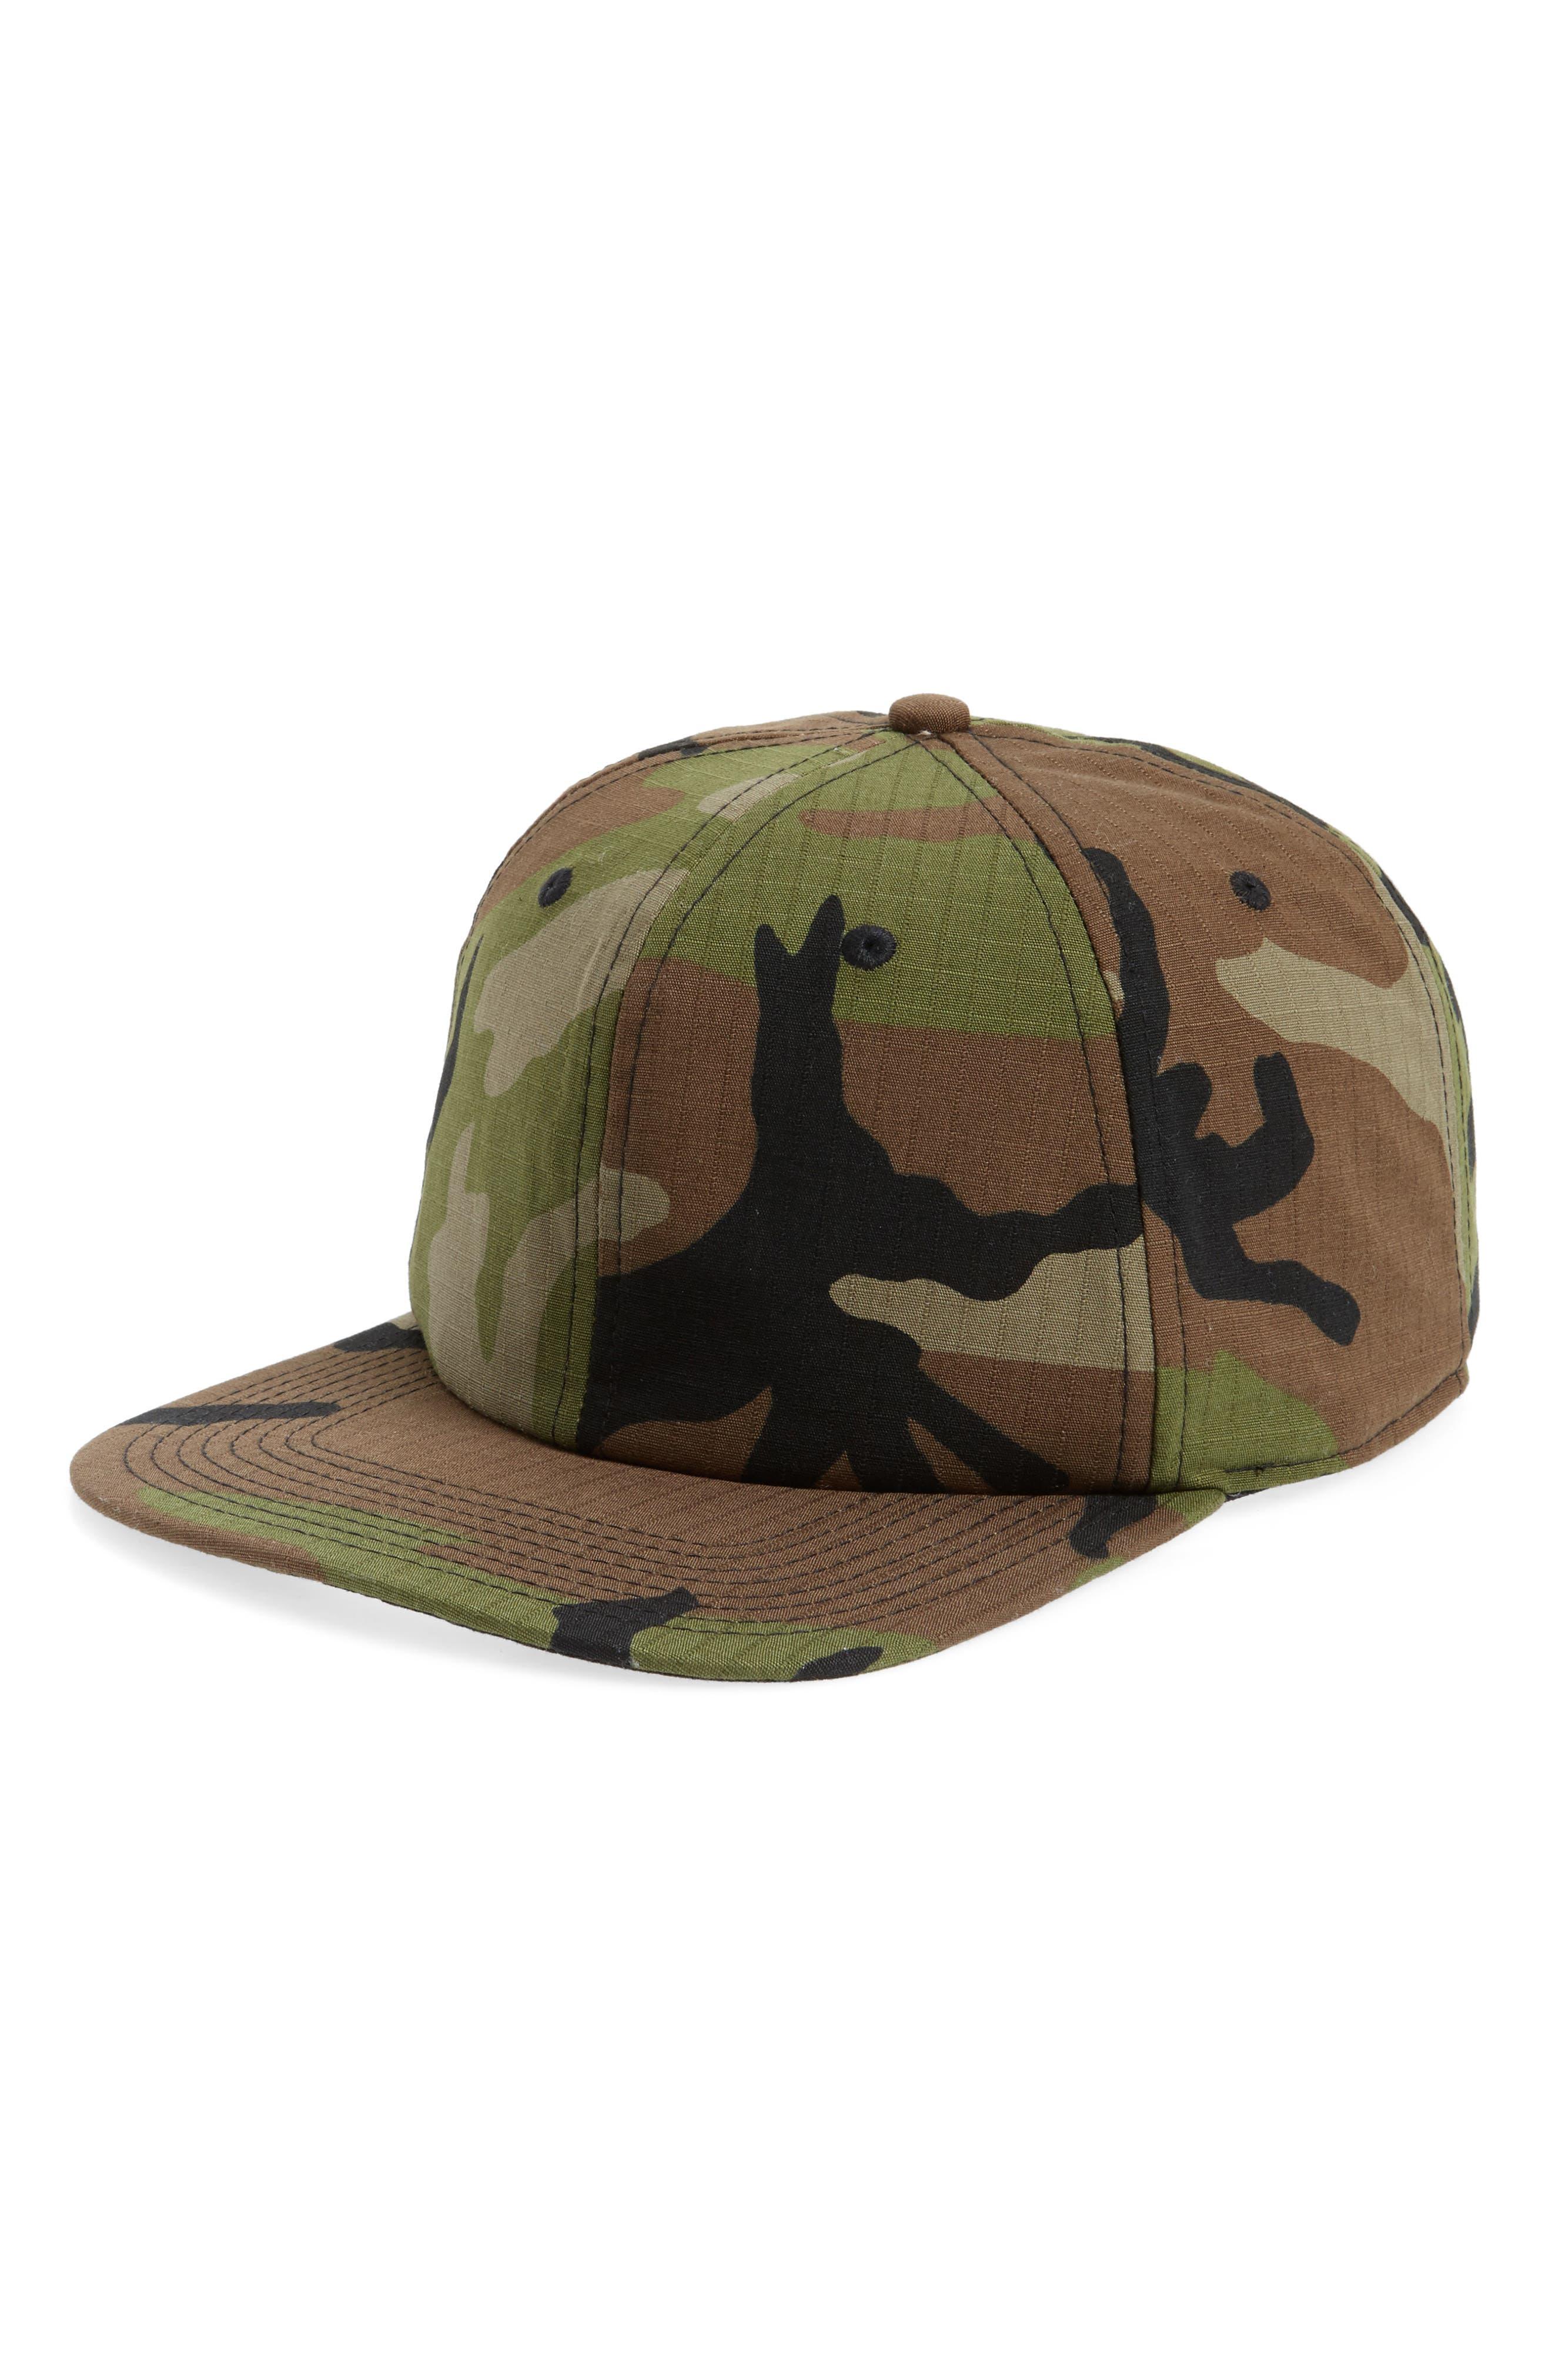 Nike Camo Snapback Cap